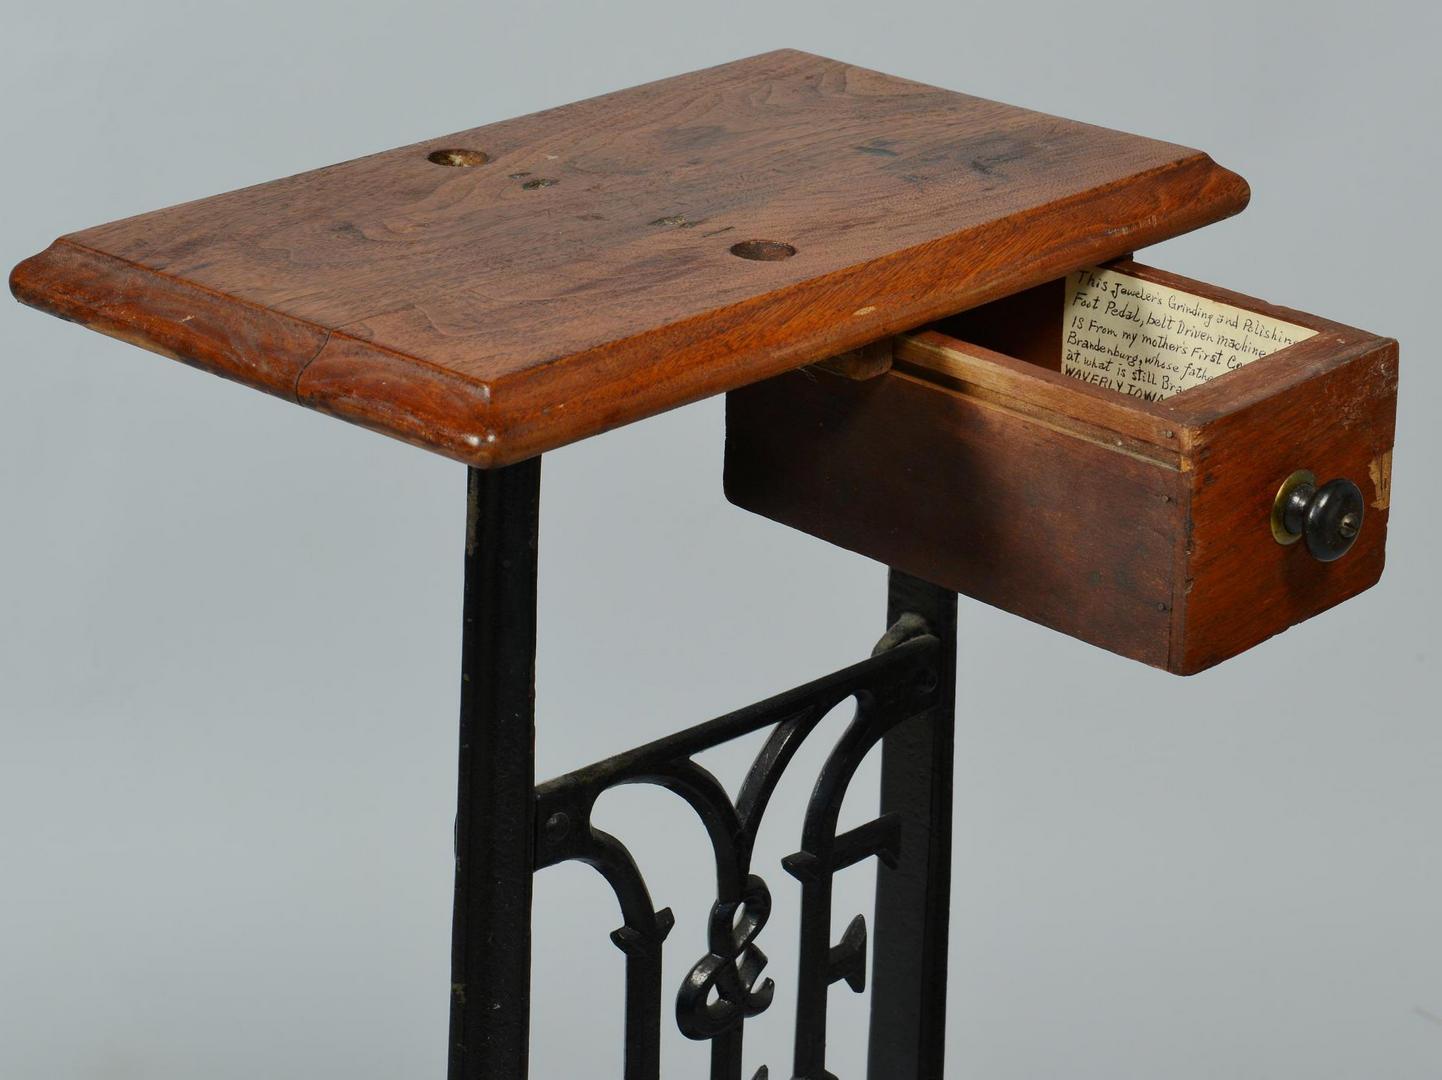 Lot 688: 19th Century Jeweler's Lathe